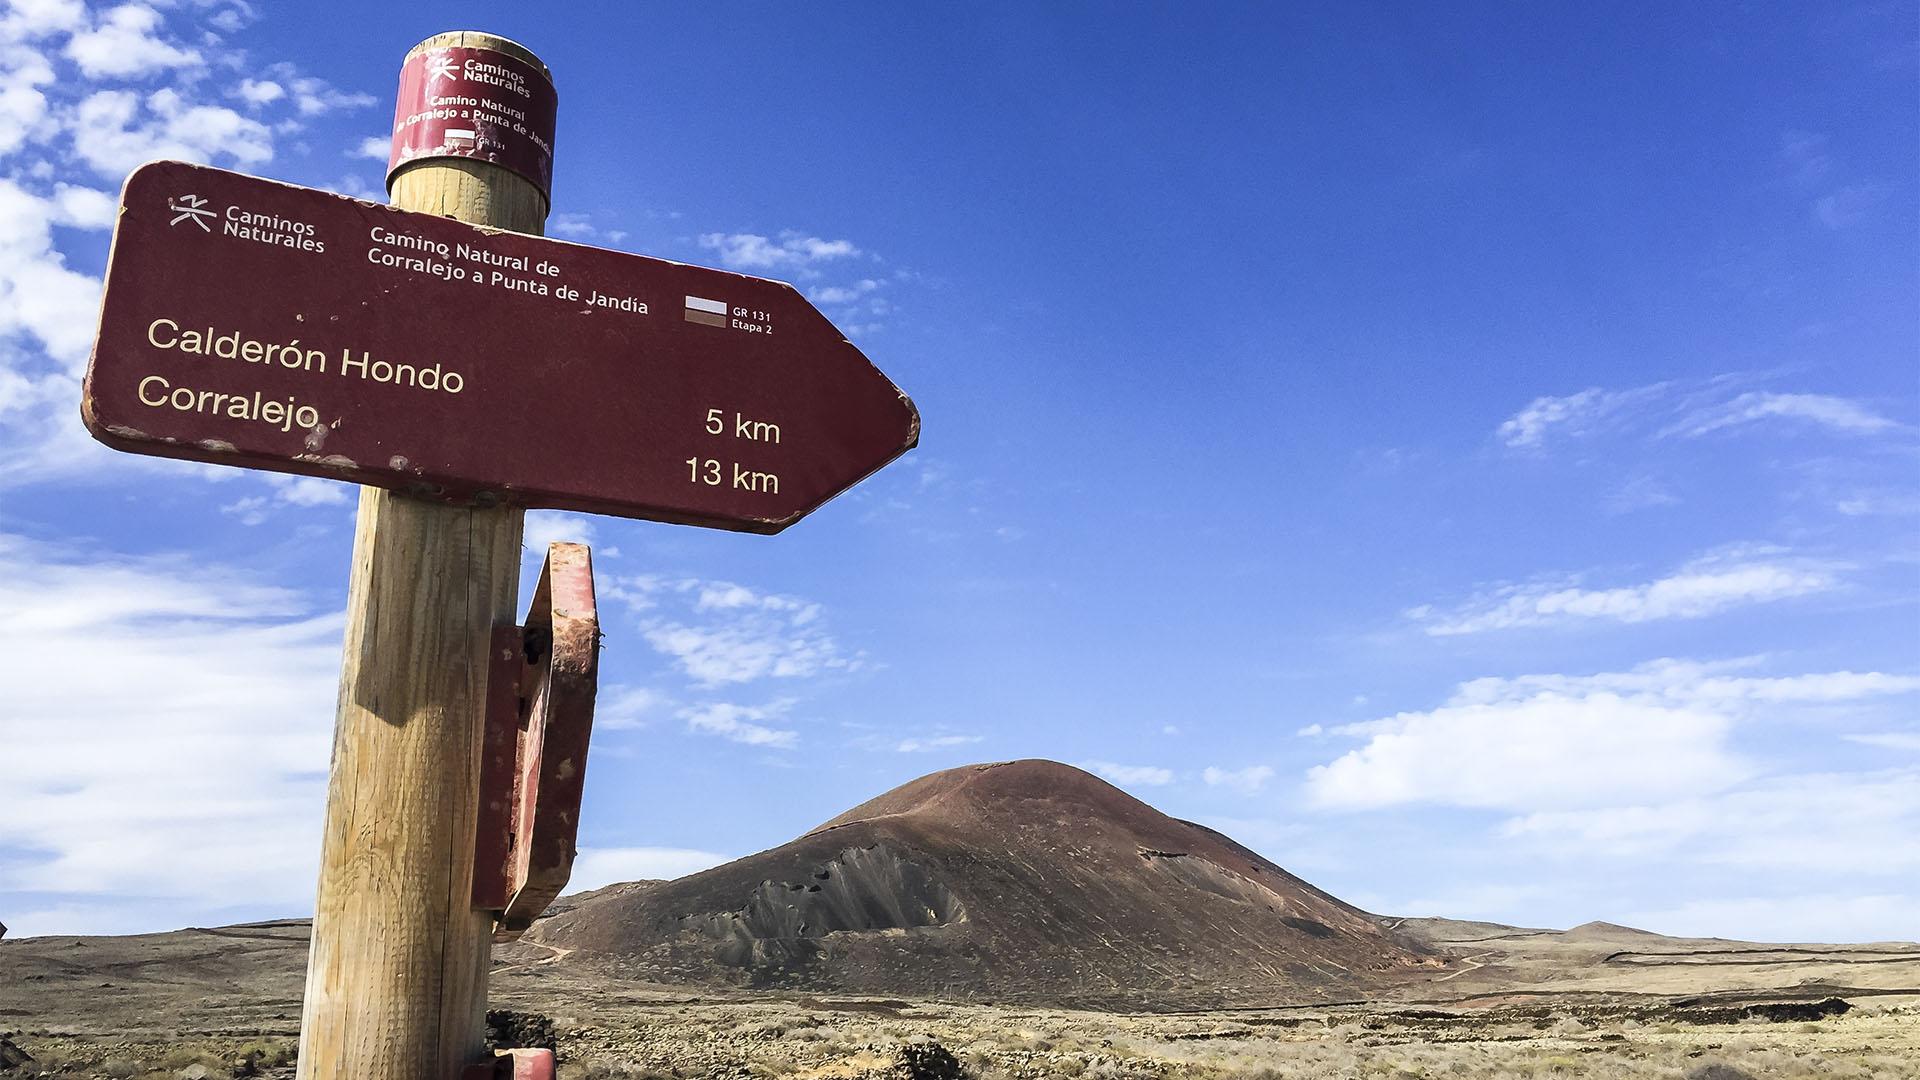 Sehenswürdigkeiten Fuerteventuras: Lajares – Calderón Hondo